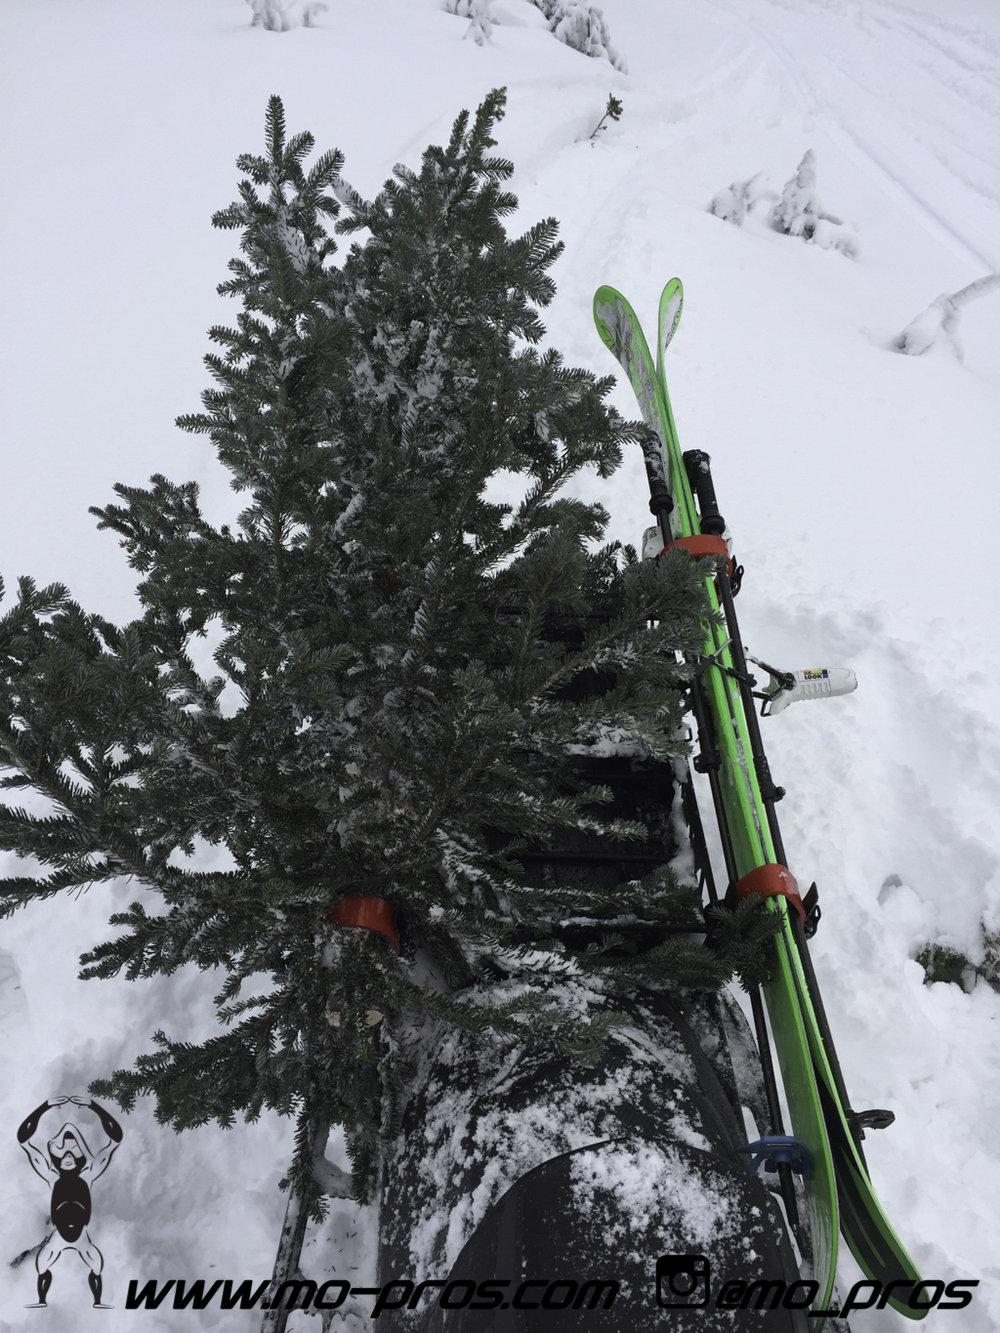 71_Backcountry _Backcountry United_CFR rack_Cheetah Factory Racing_gas Rack_Gear_Gun Rack_LinQ Snowboard Ski_Rack_Ski_Snowbike_snowboard_Snowboard rack_Snowboarding_Snowmobile_snowmobile bag_timbersl.jpg